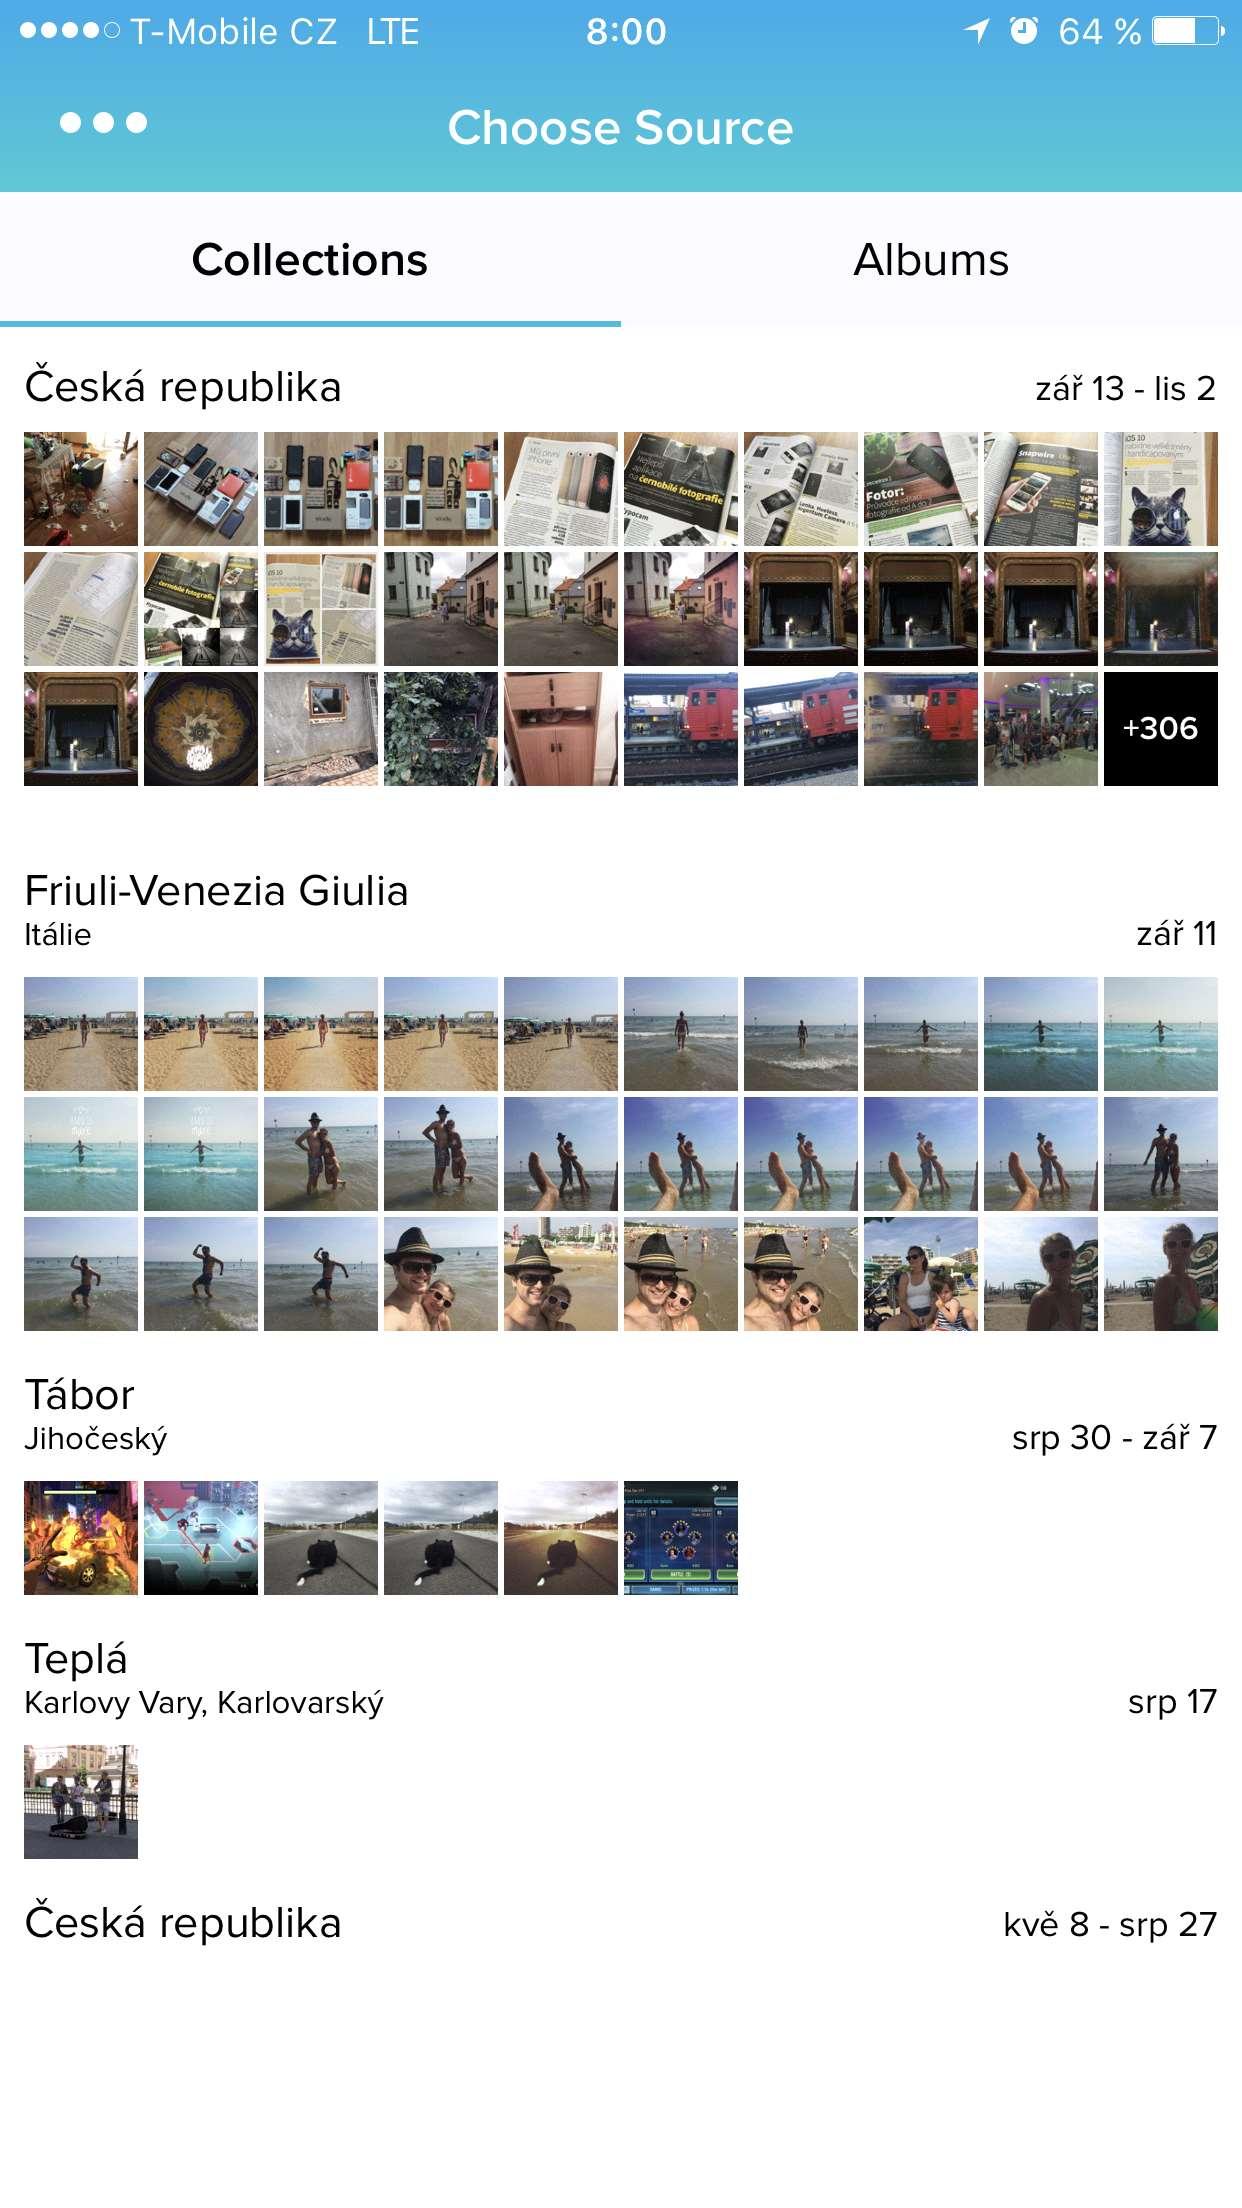 3fa0bdc7f834 Blurb – mobilní aplikace k tvorbě stylových fotoknih – DIGIarena.cz